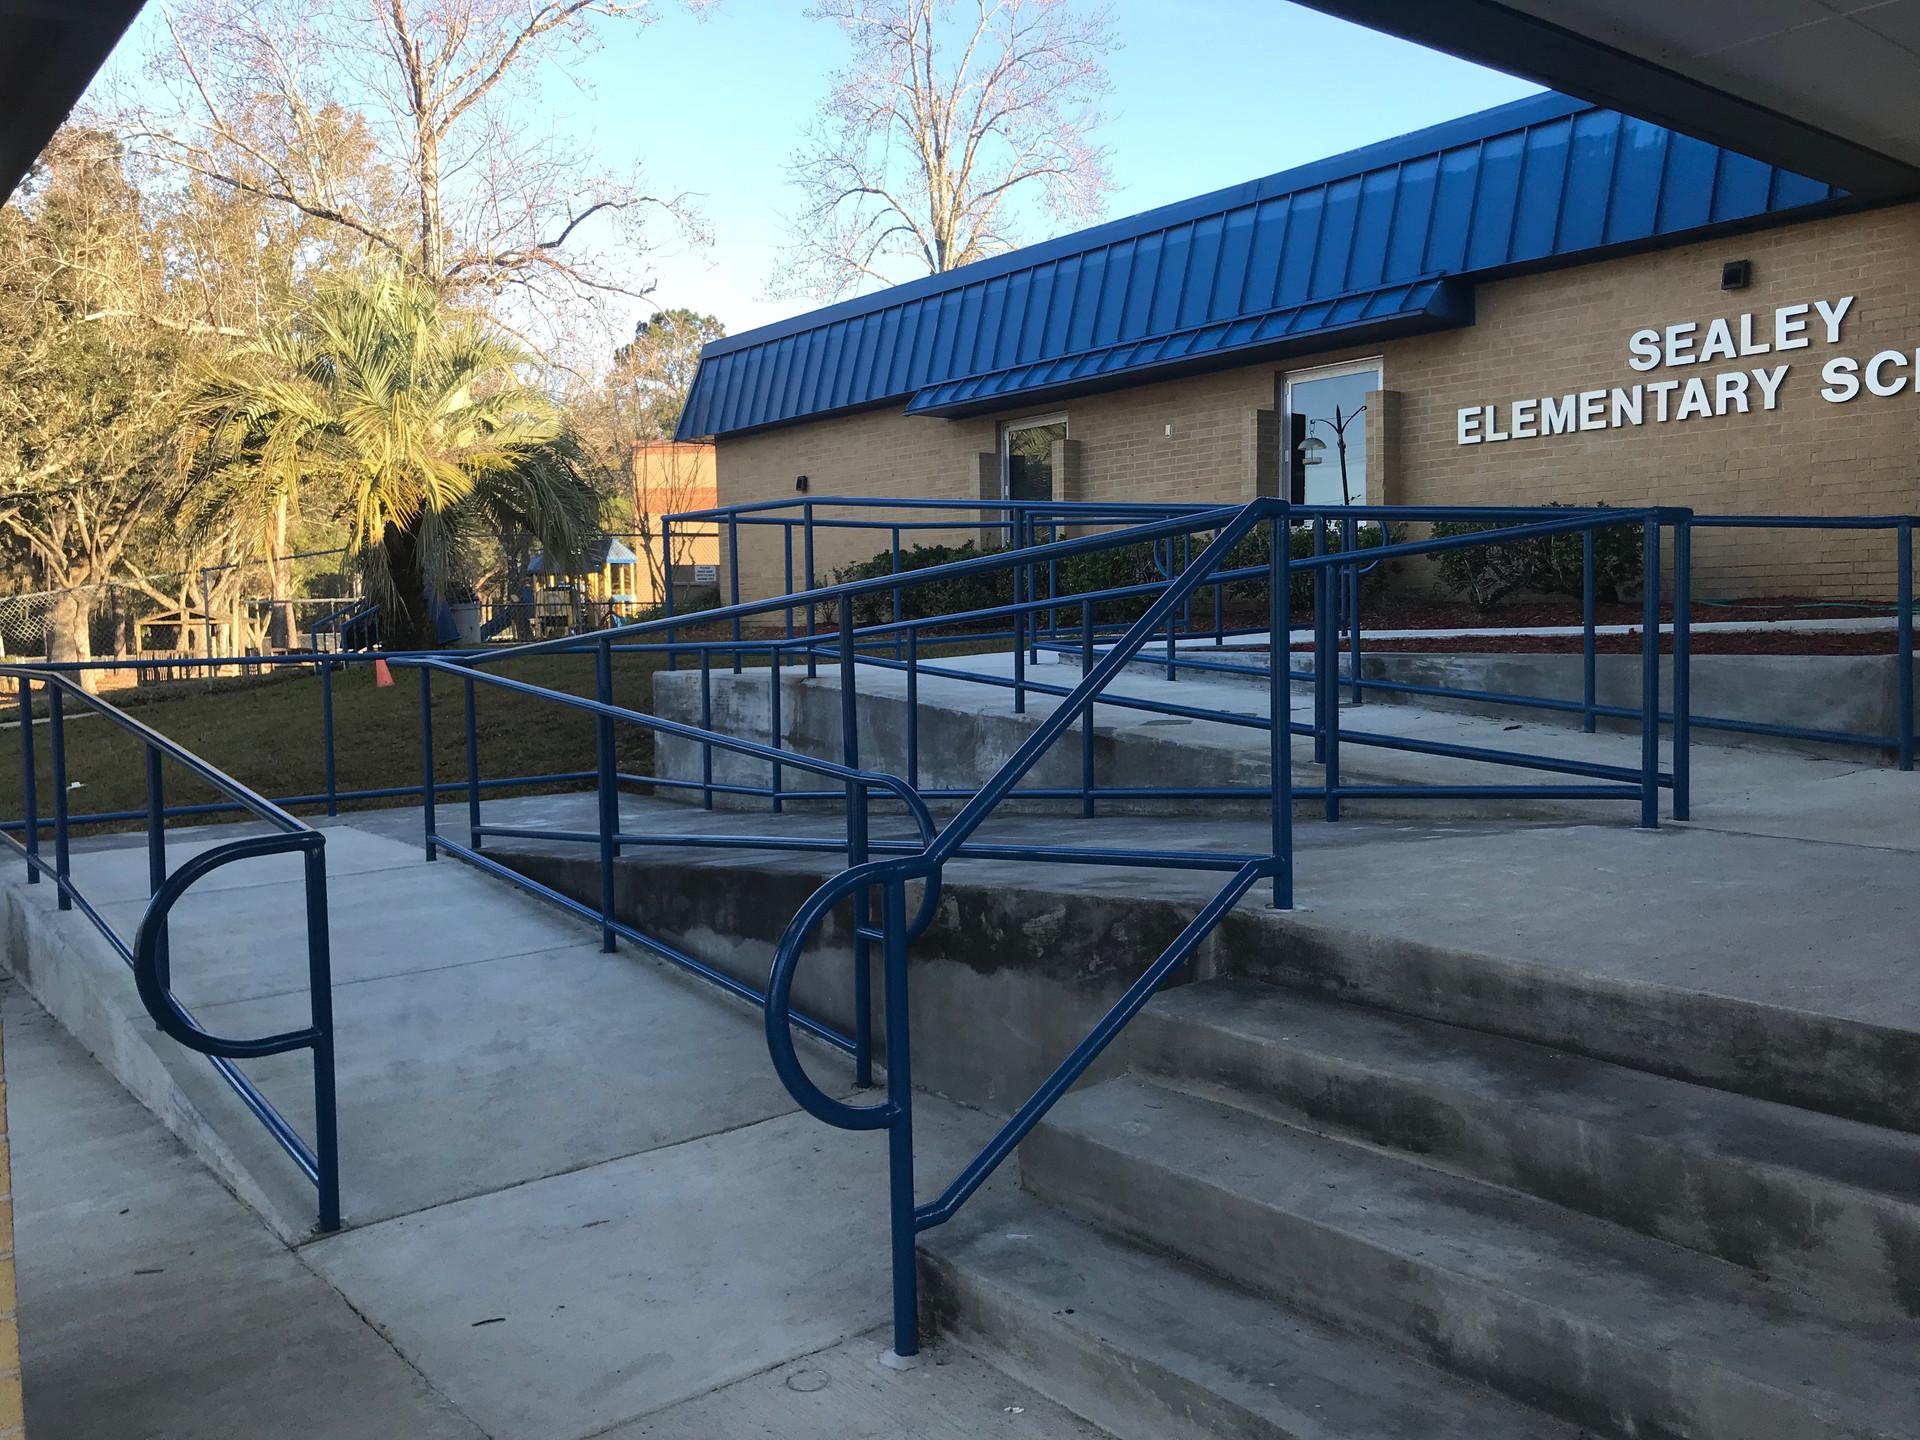 Sealey Elementary School